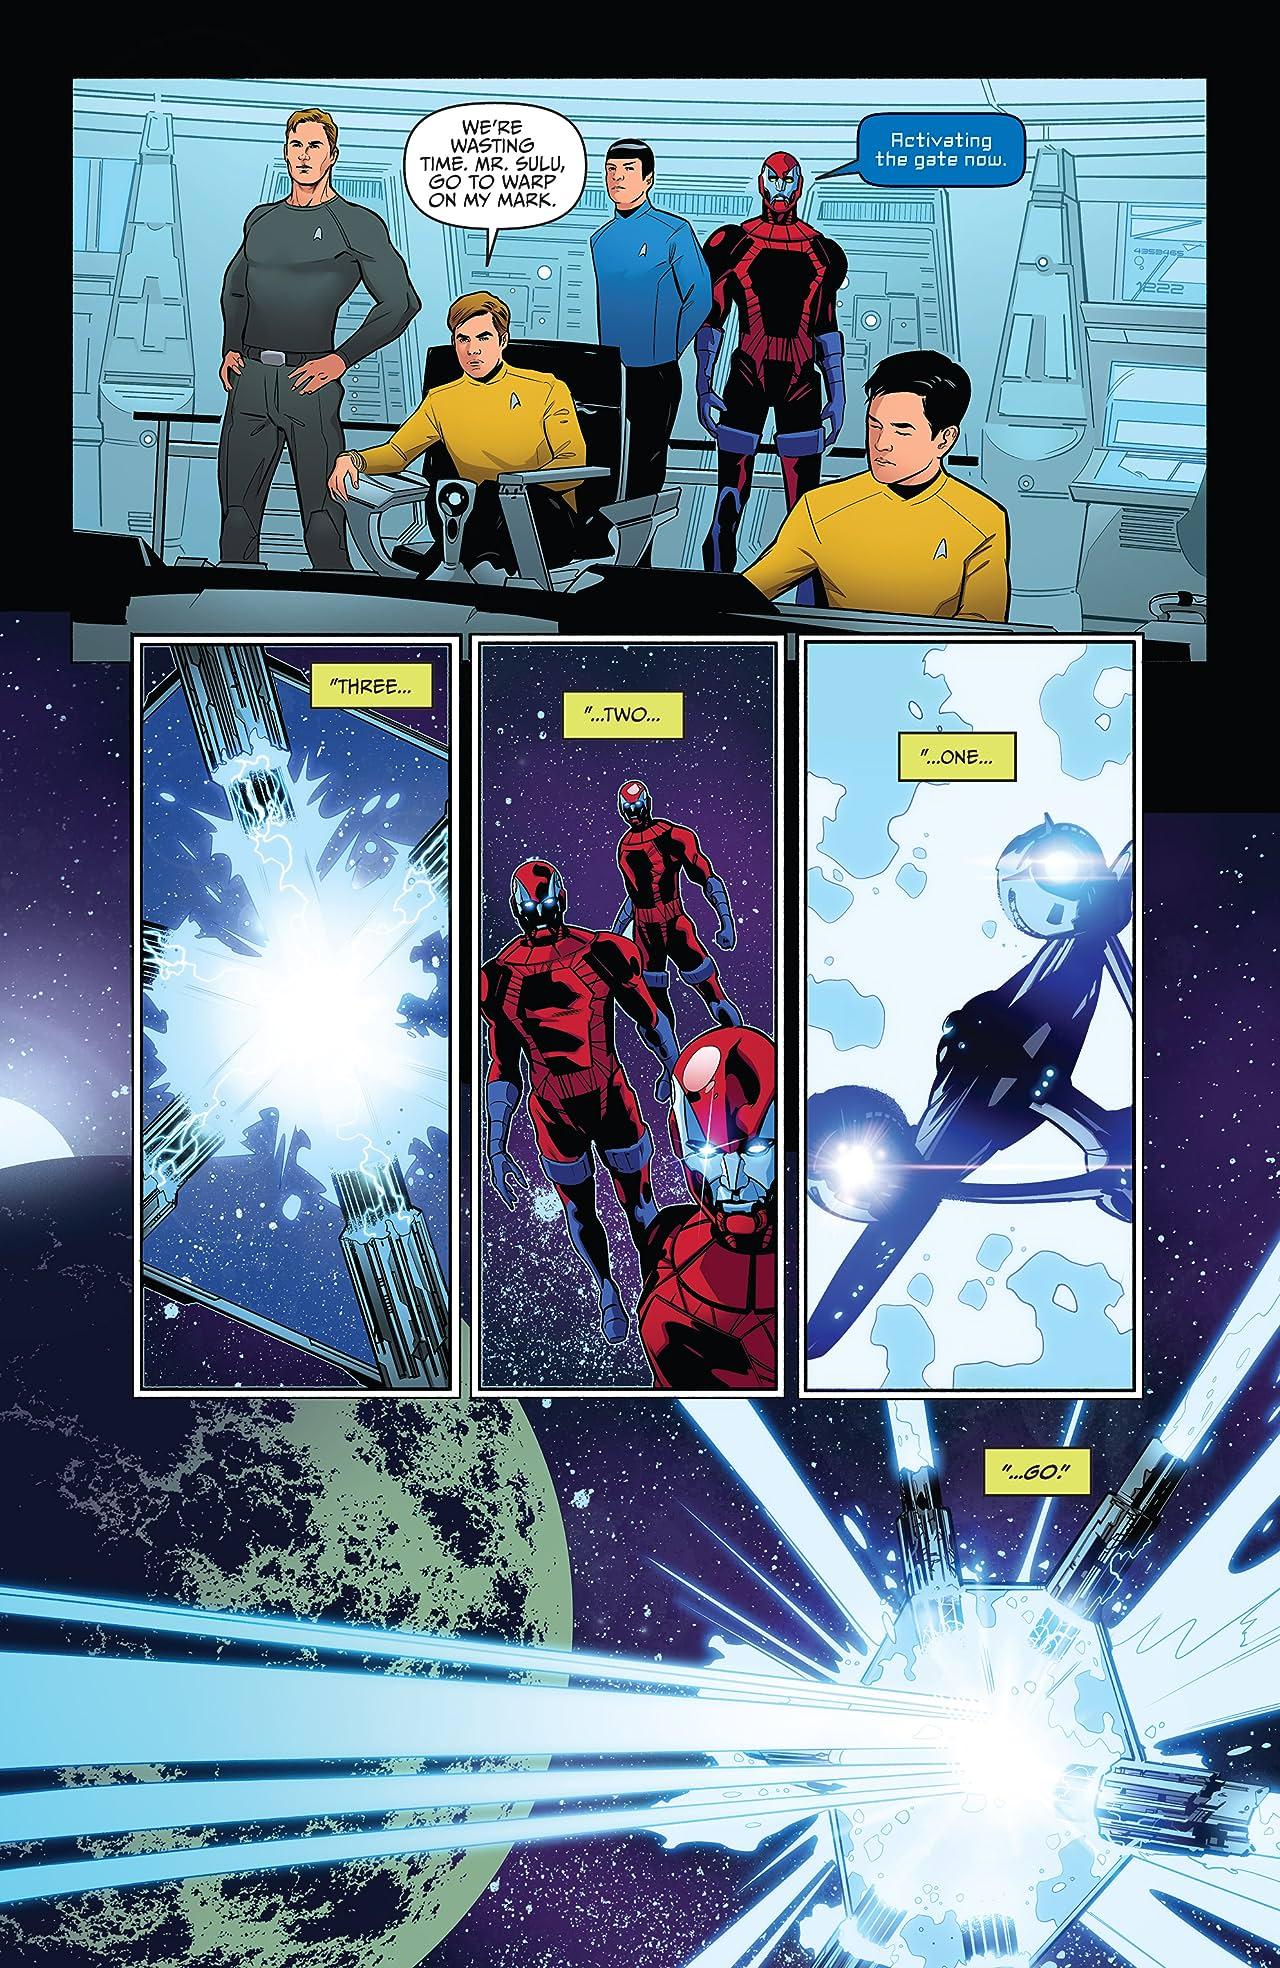 Star Trek/Green Lantern Vol. 2 #5